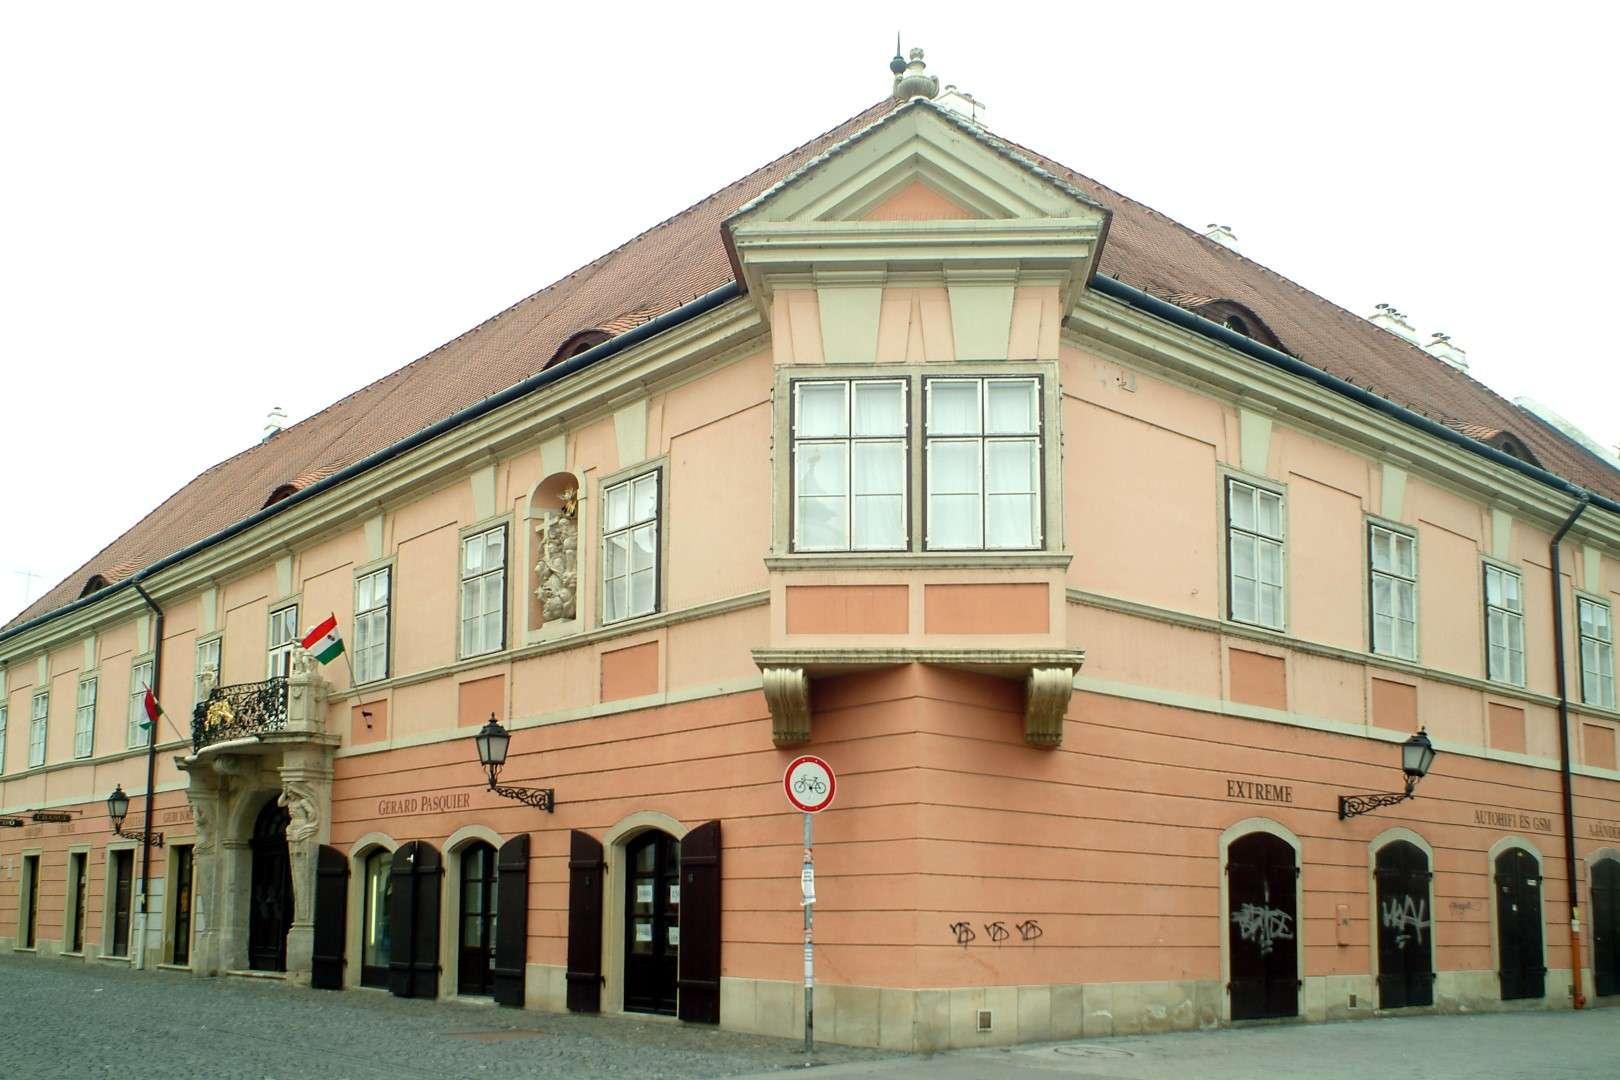 <a href='http://hellogyor.hu/de/sehenswurdigkeiten/esterhazy-palais/'>Esterházy-Palais</a>